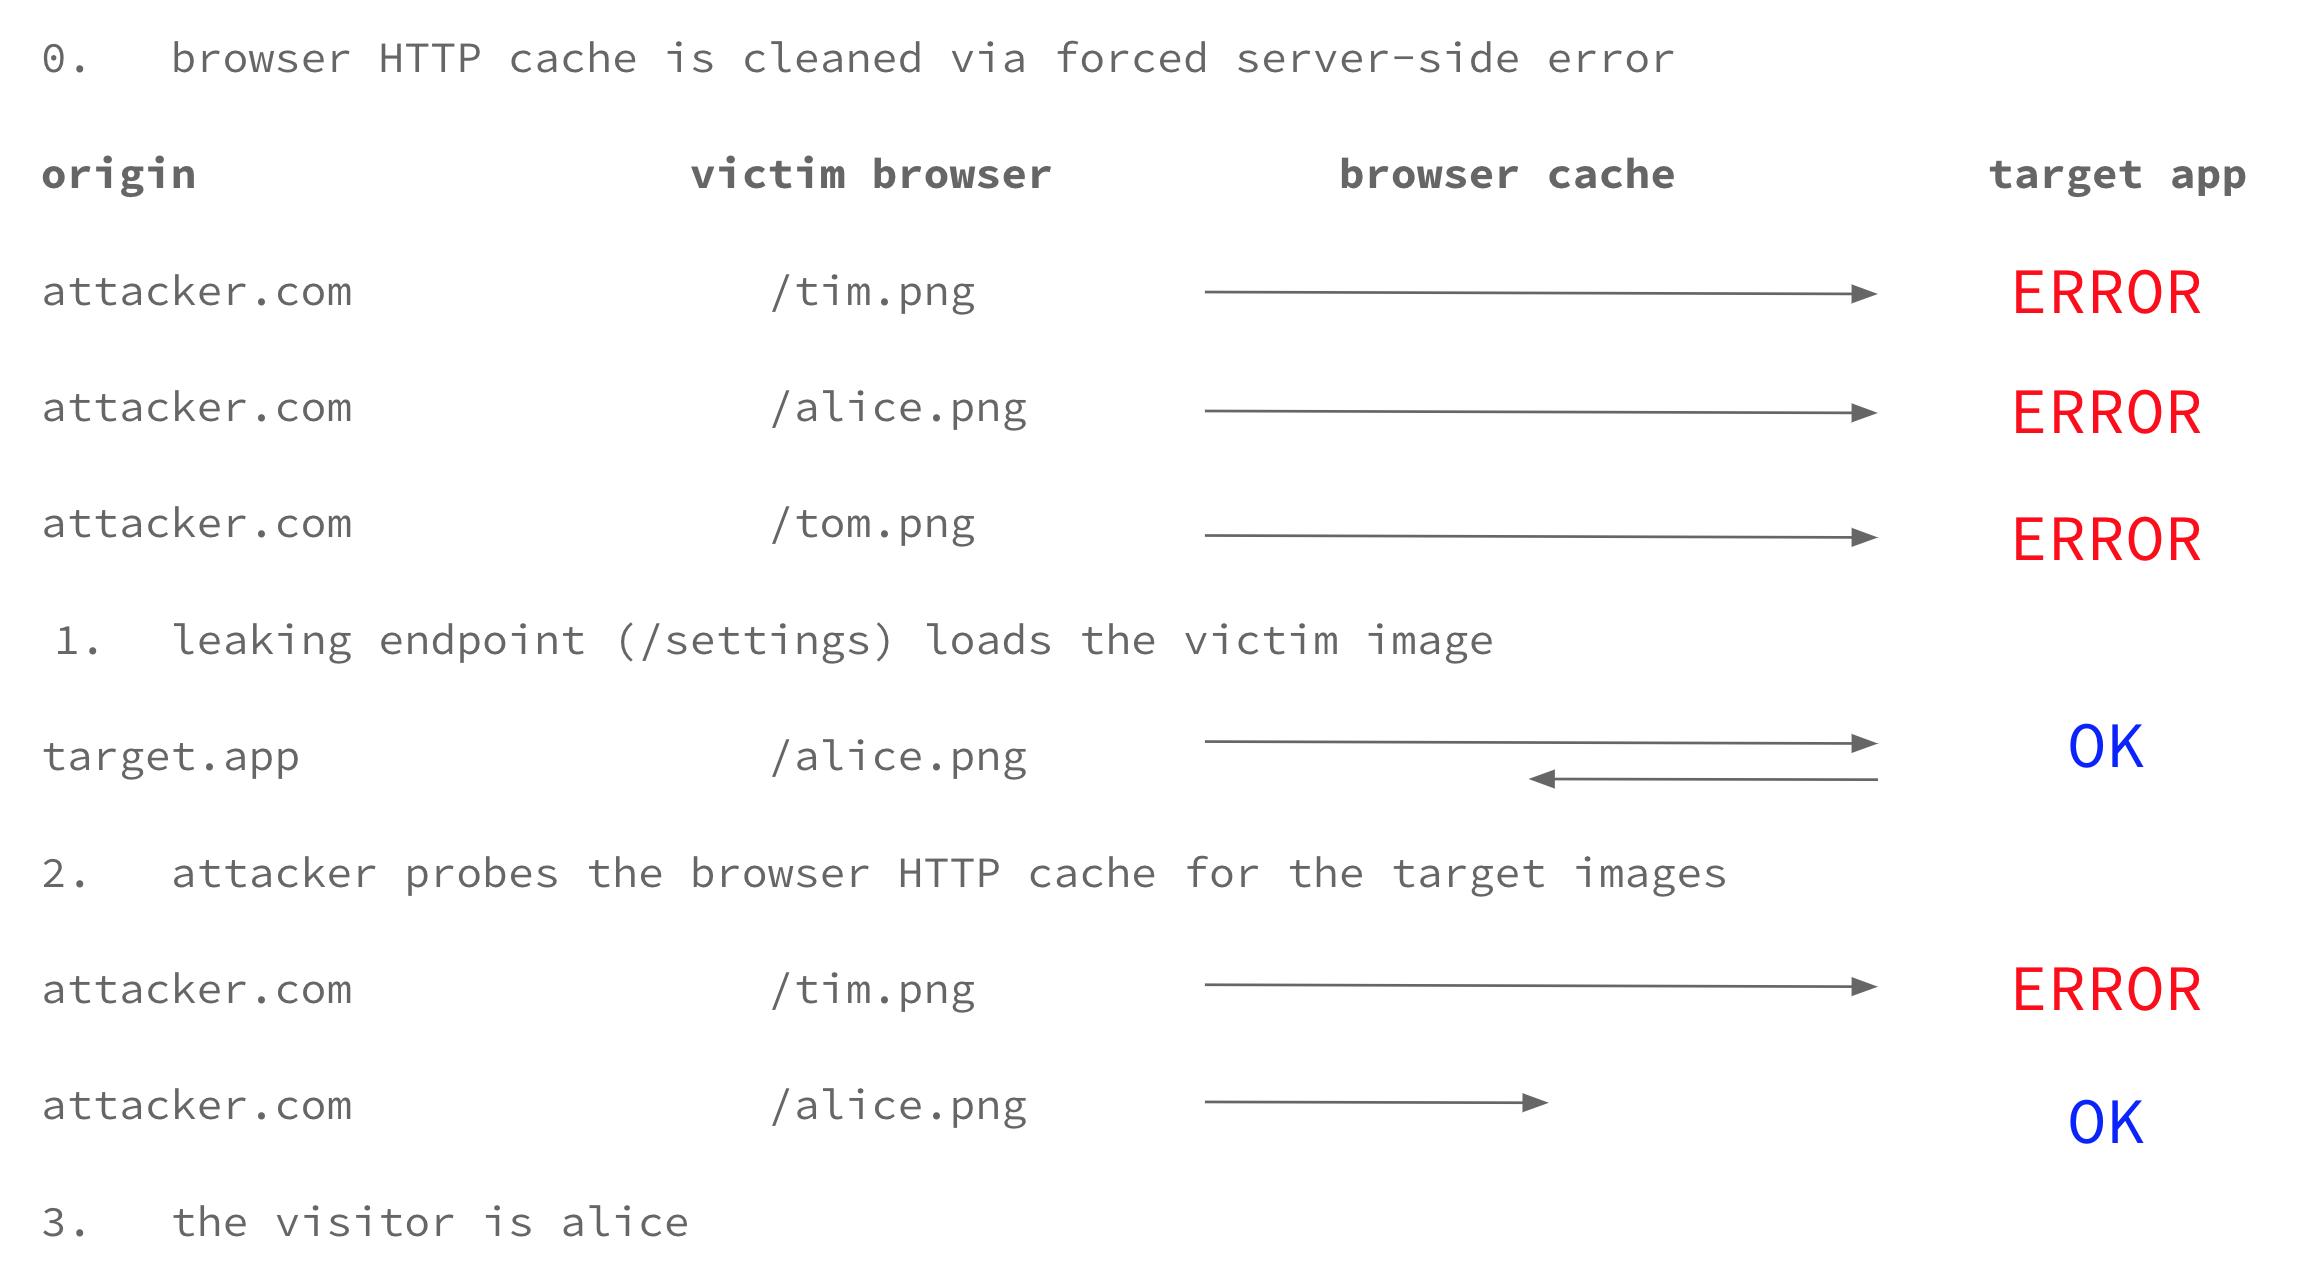 polict net   Web tracking via HTTP cache cross-site leaks